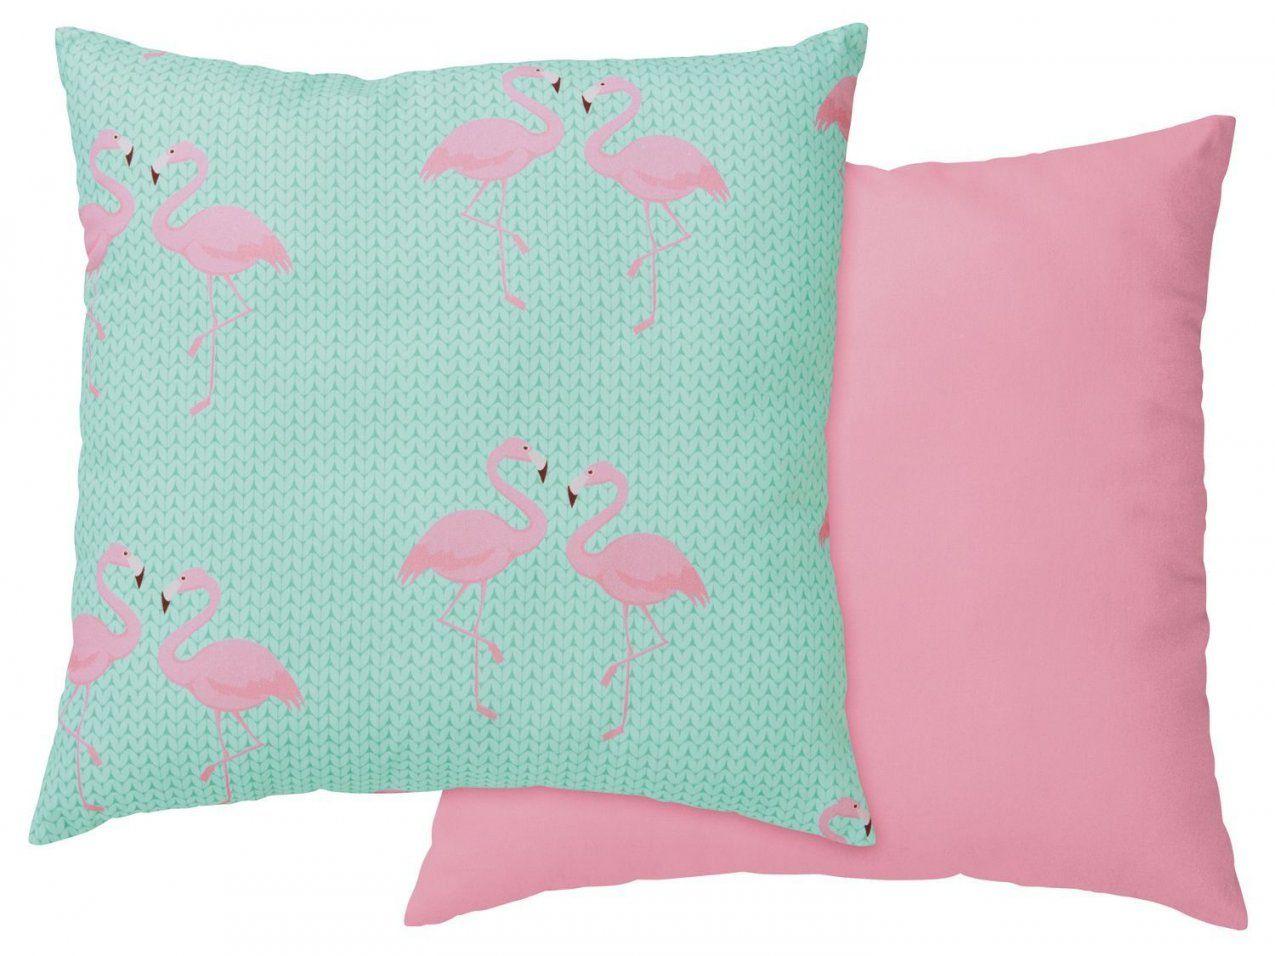 sehr gehend od inspiration lidl bettw sche flamingo und angenehme von lidl bettw sche flamingo. Black Bedroom Furniture Sets. Home Design Ideas